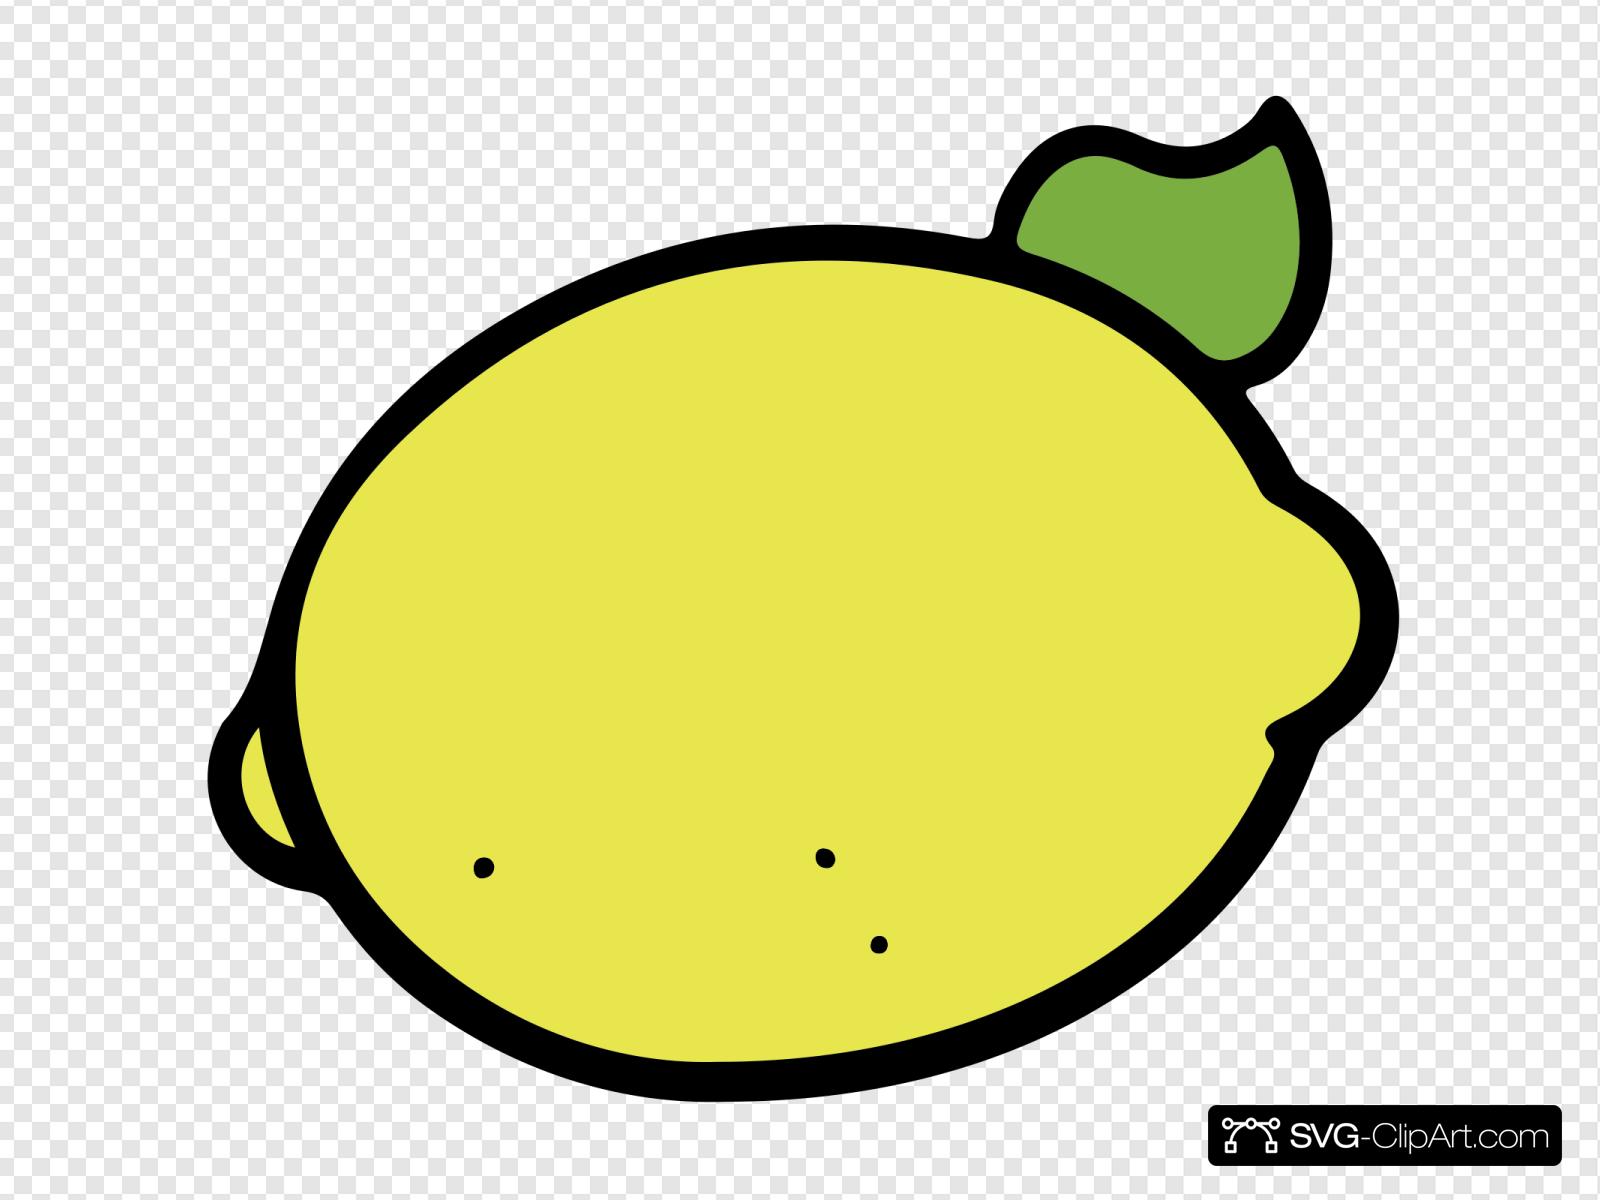 Lemon clipart yellow thing, Lemon yellow thing Transparent.